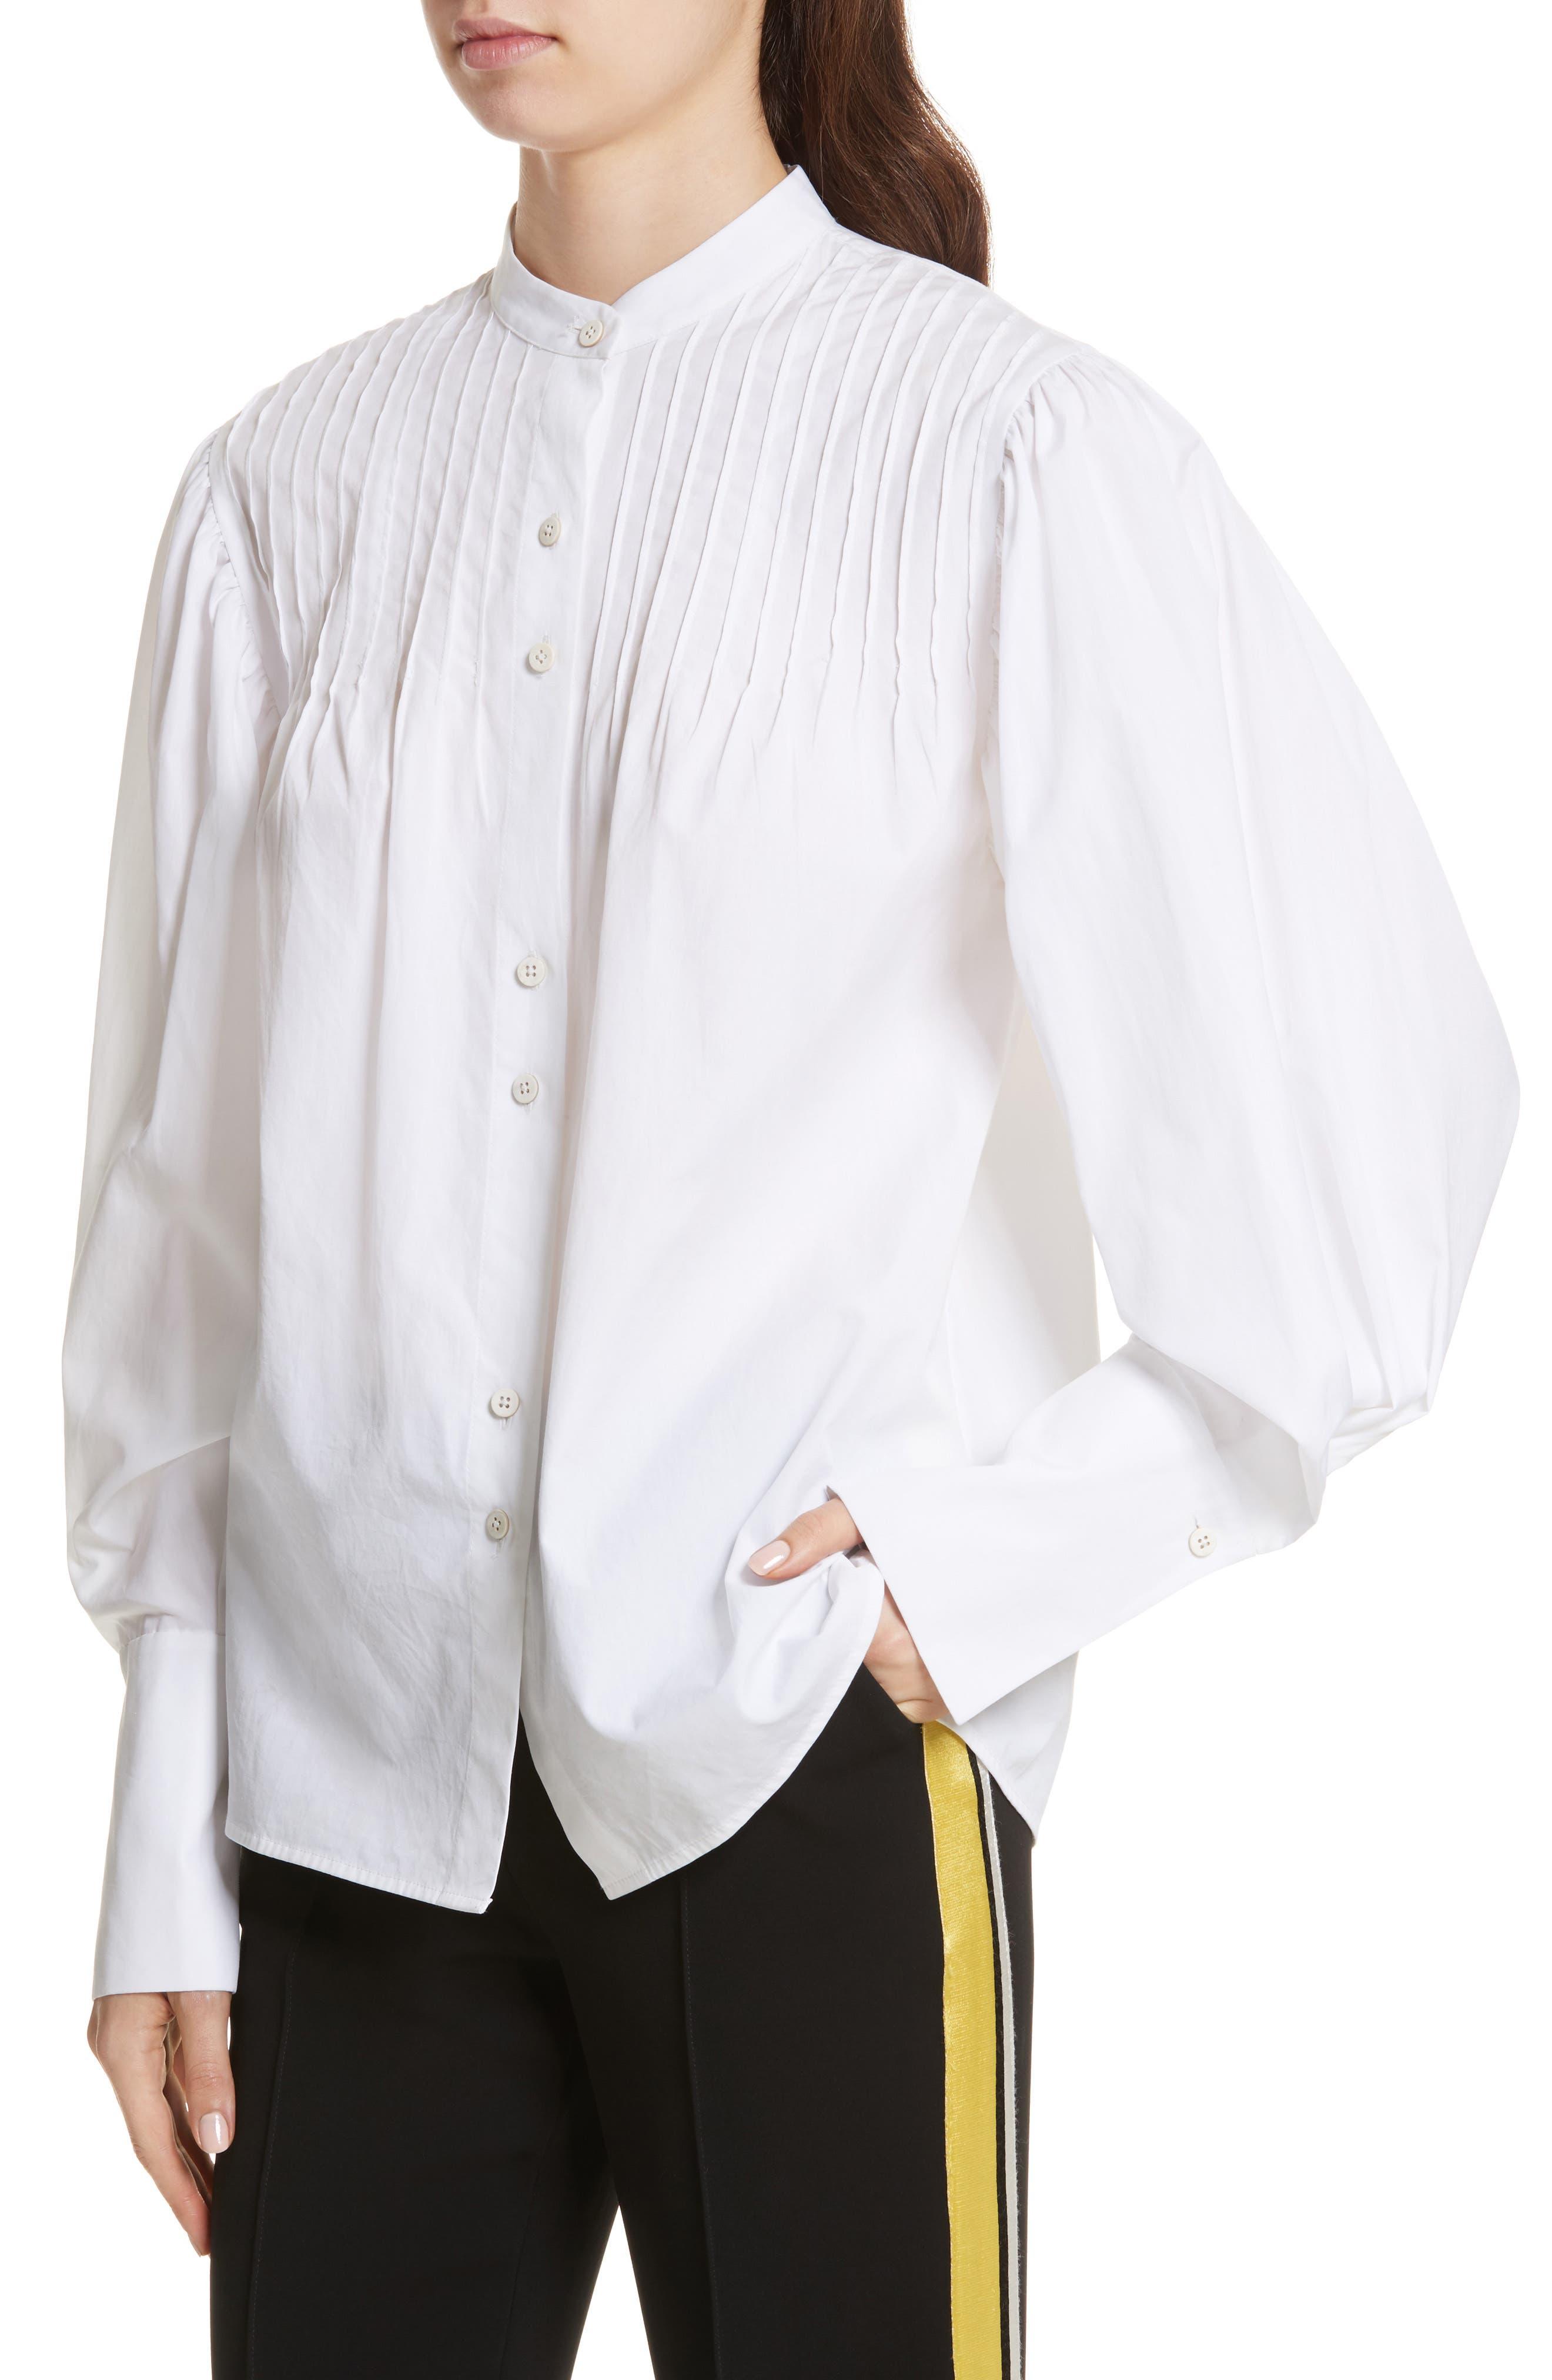 Diane von Furstenberg Pintuck Cotton Blouse,                             Alternate thumbnail 4, color,                             100